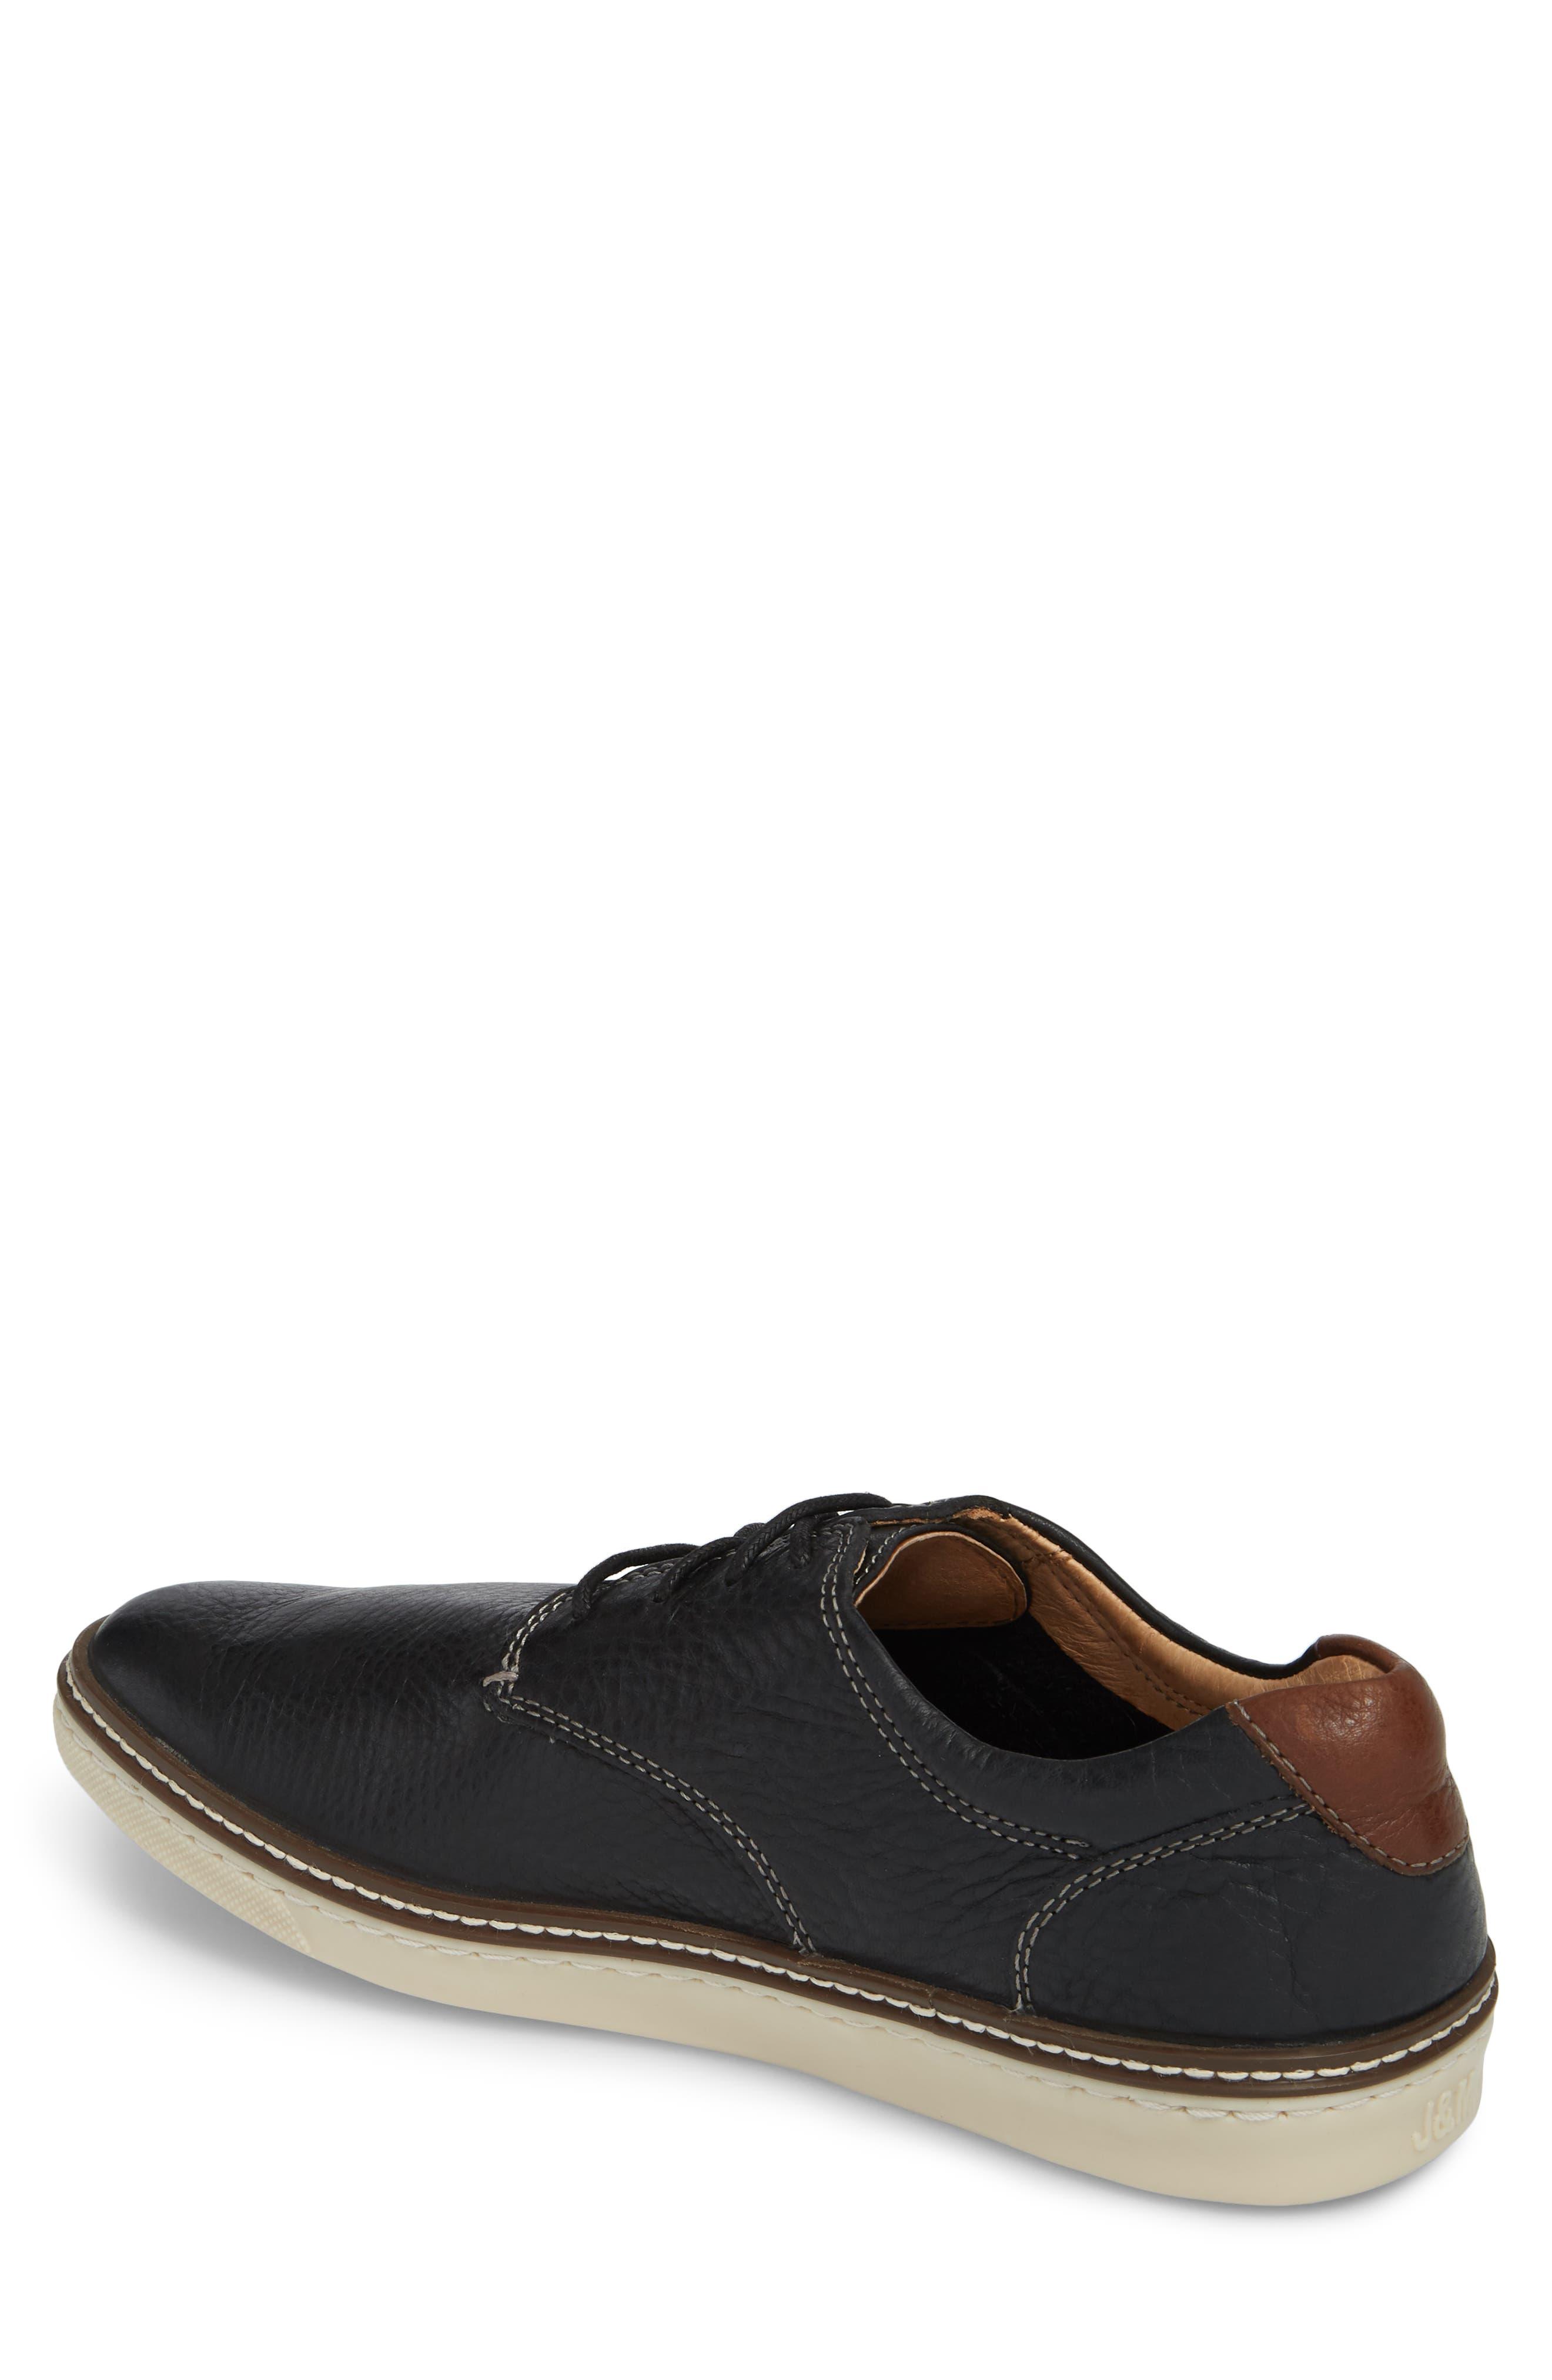 McGuffey Derby Sneaker,                             Alternate thumbnail 2, color,                             BLACK LEATHER